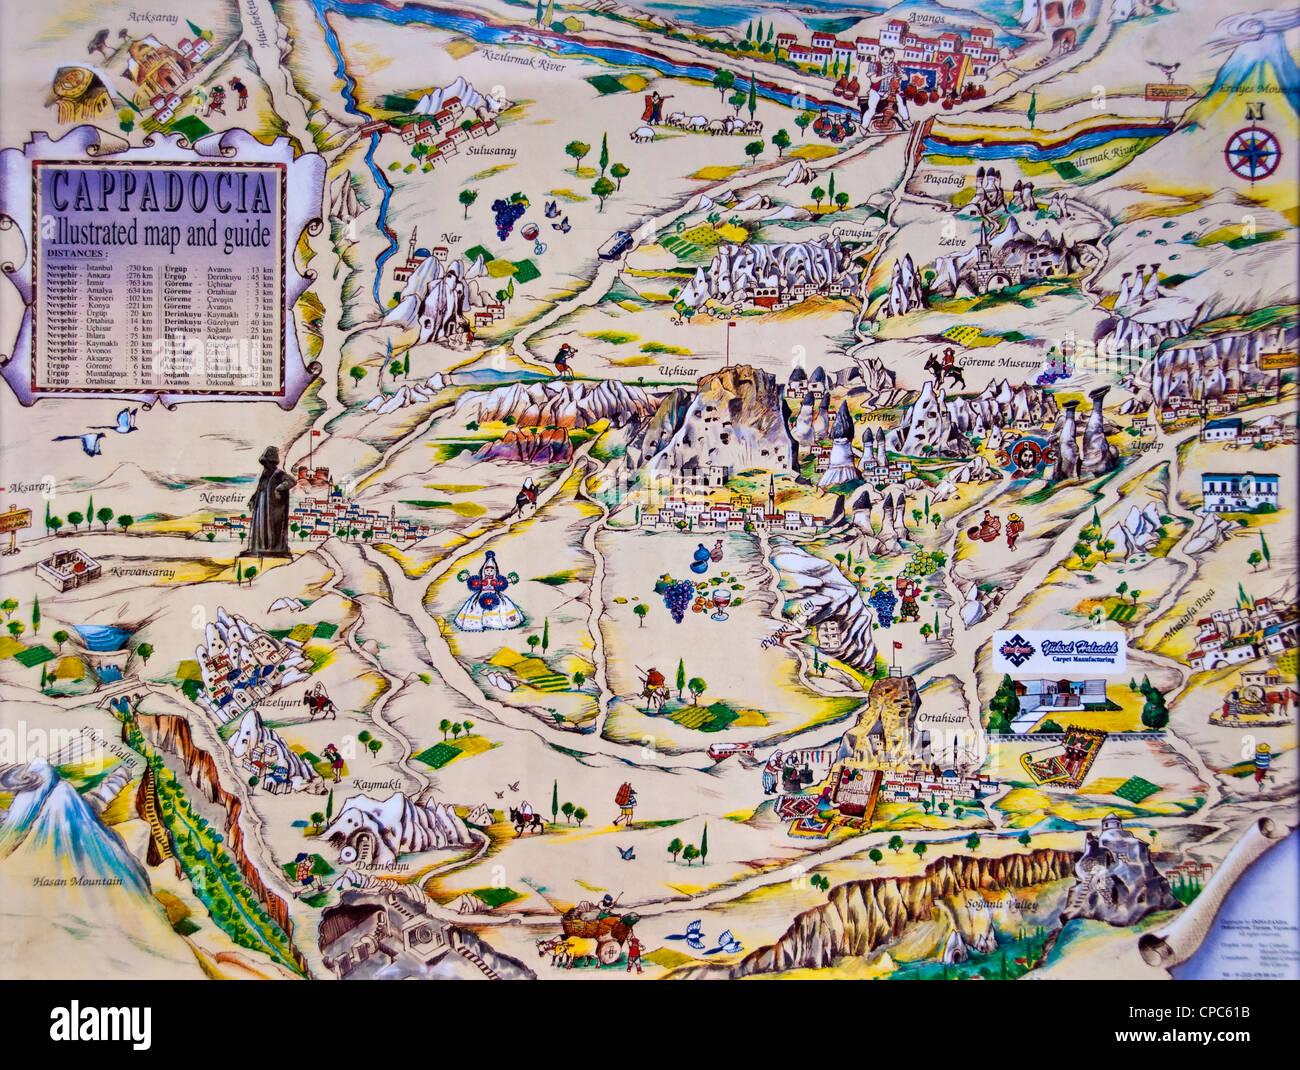 Karte Türkei Kappadokien.Illustrierte Karte Von Kappadokien Türkei Stockfoto Bild